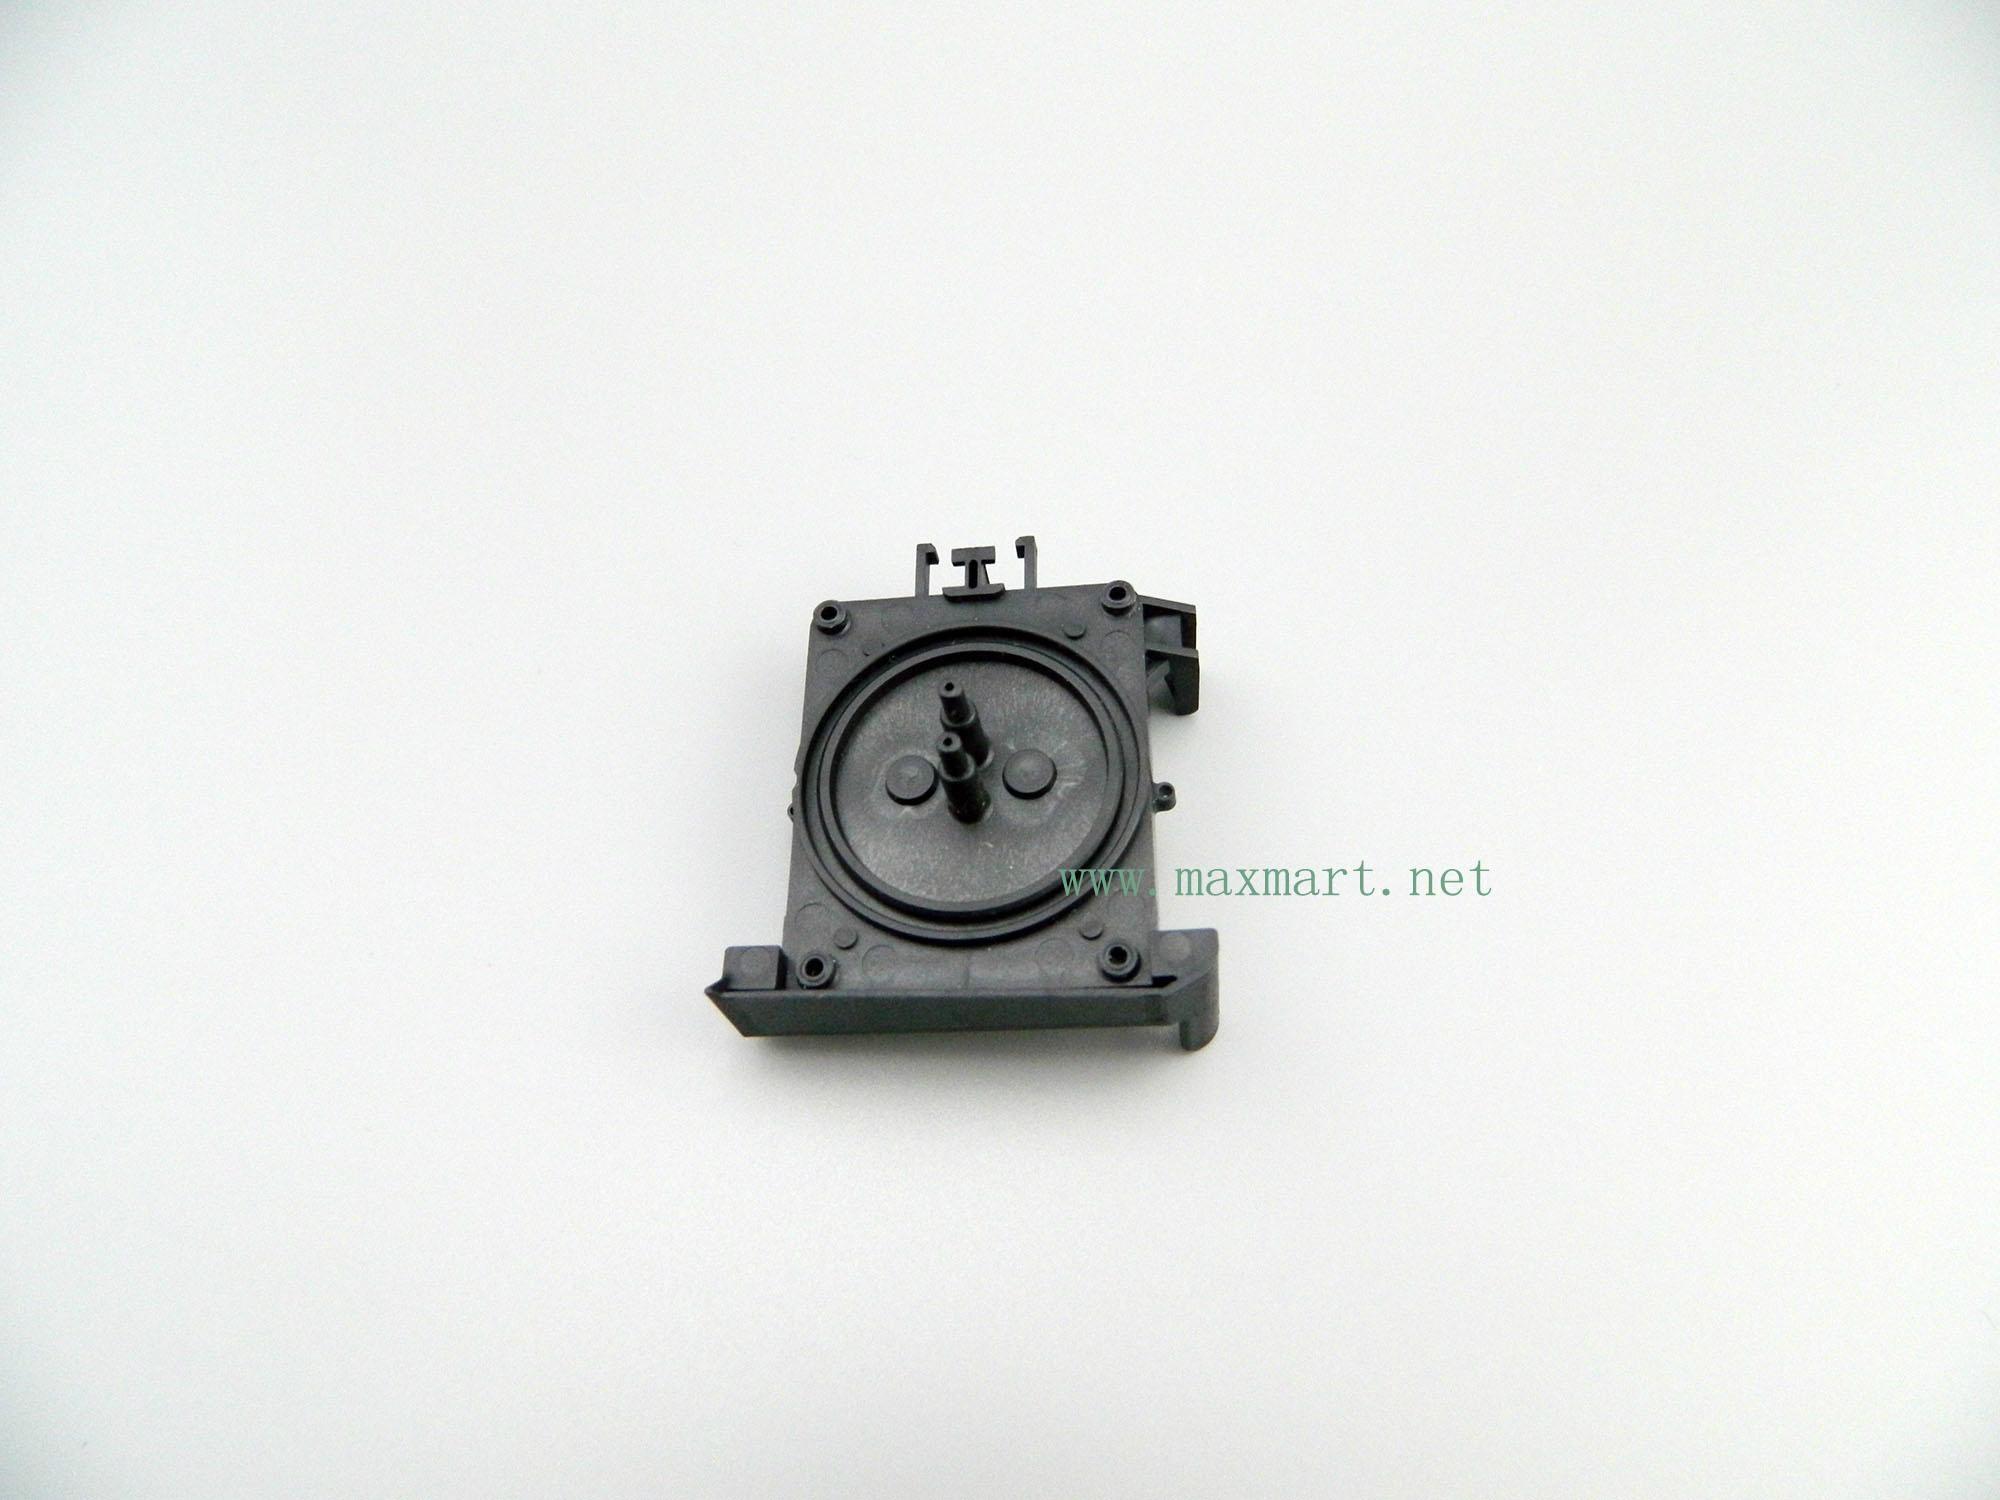 Cap top for Epson Stylus Pro 4800 4880 7800 7880 4